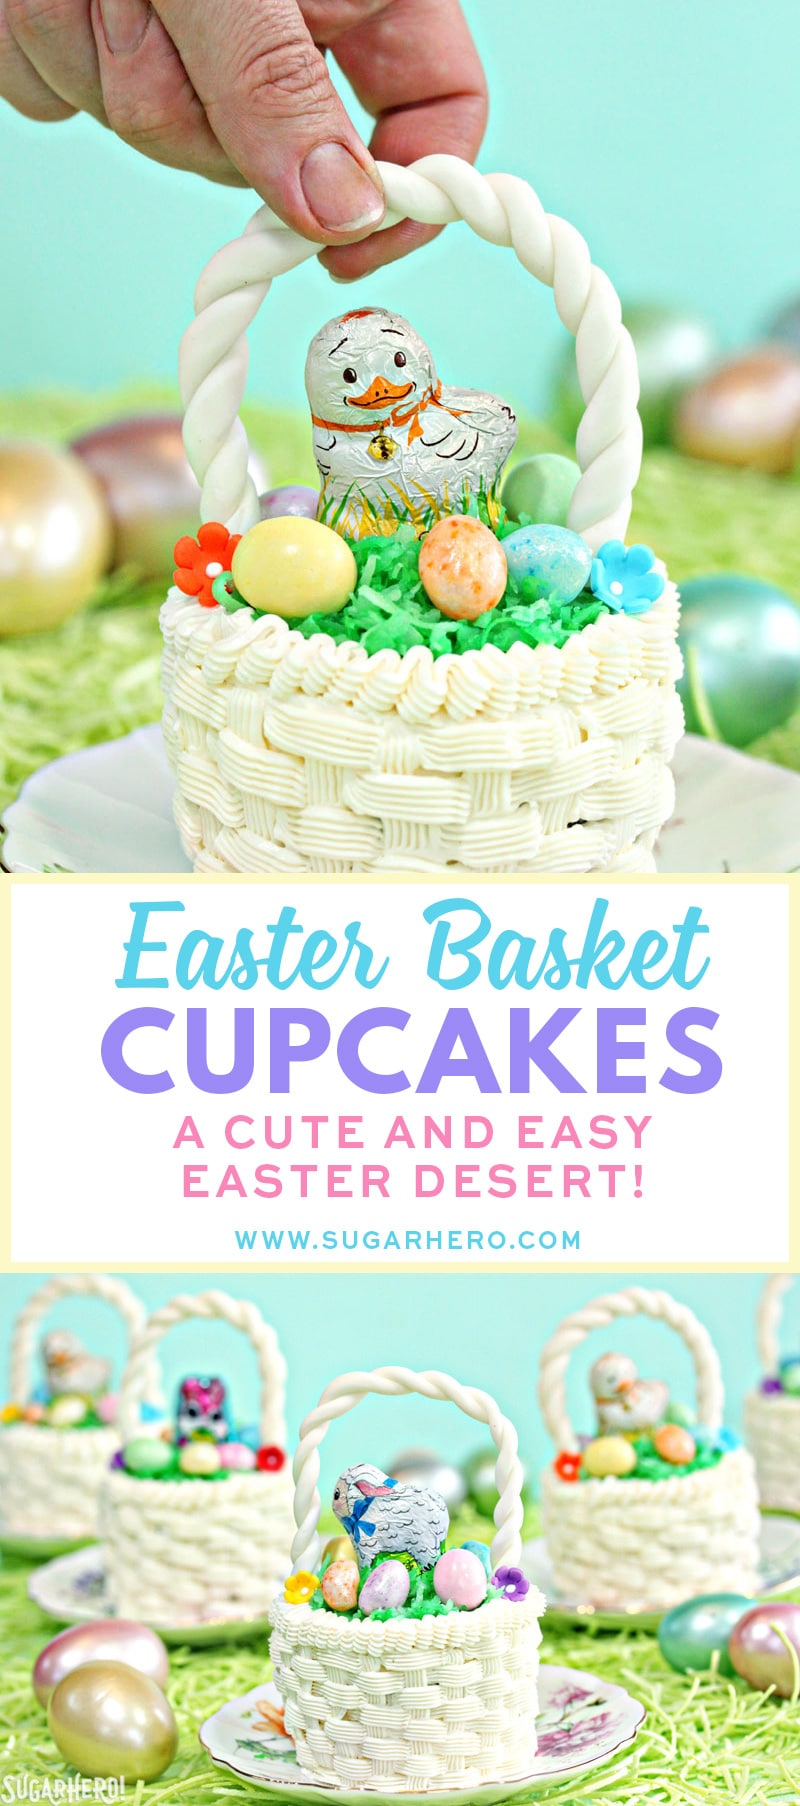 Easter Basket Cupcakes   From SugarHero.com